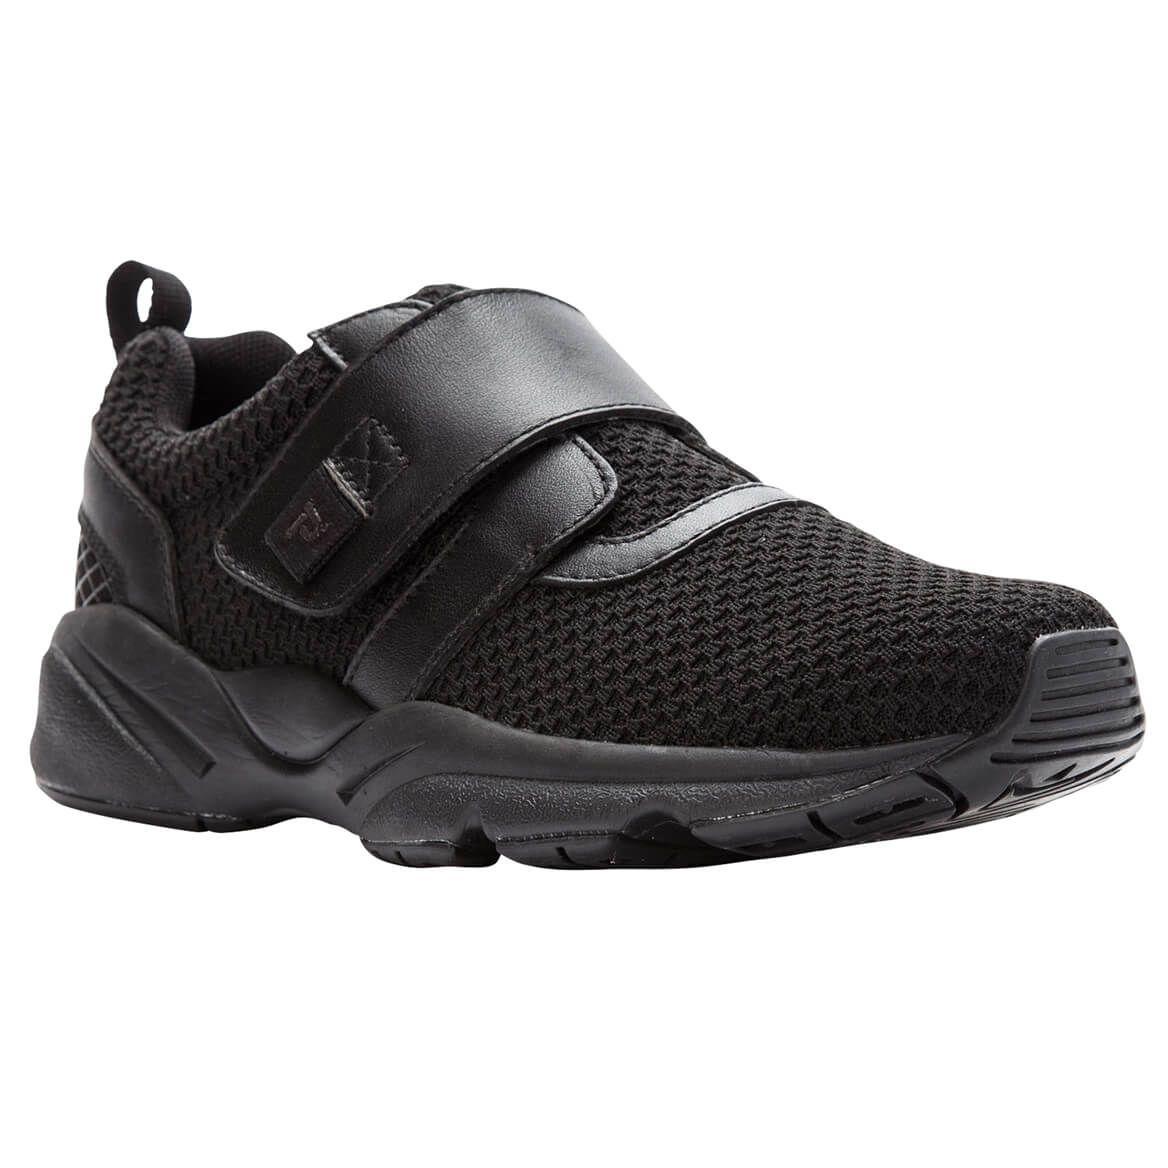 Propet® Stability X Strap Women's Sneaker - RTV-368357